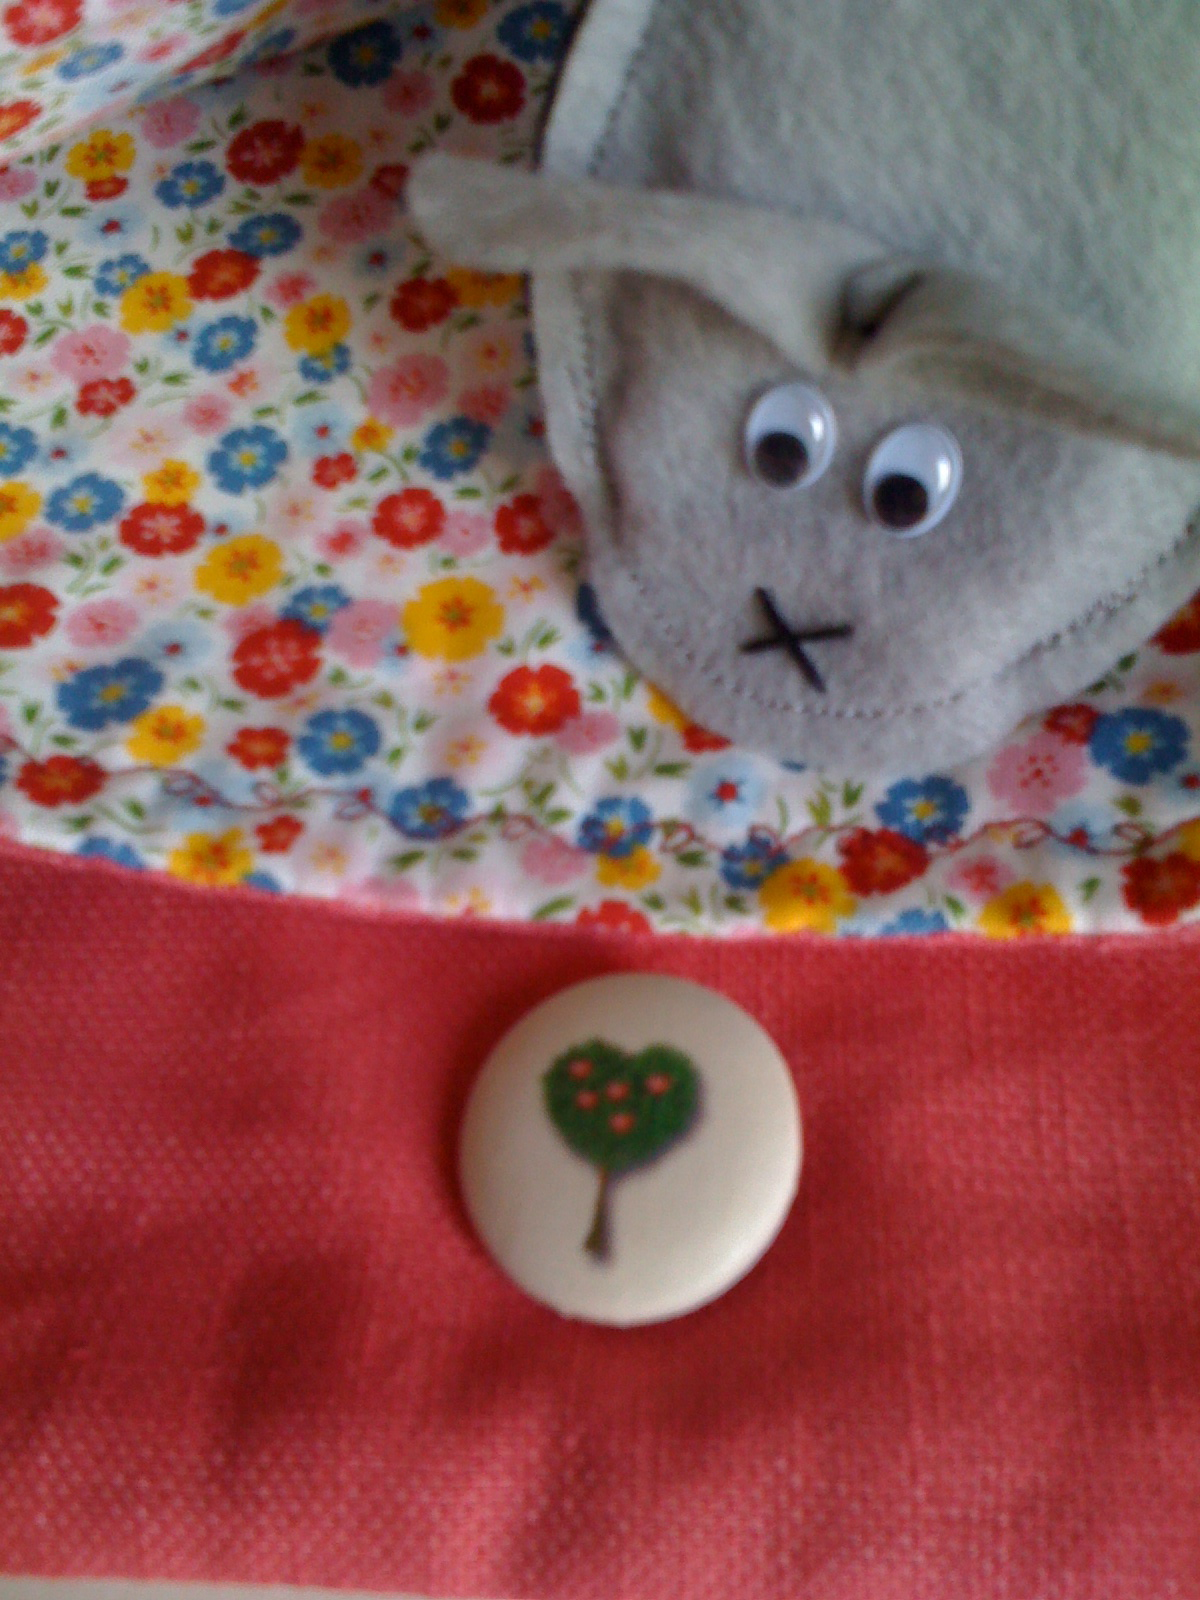 - Original Handmade Itemsmade with love by me!